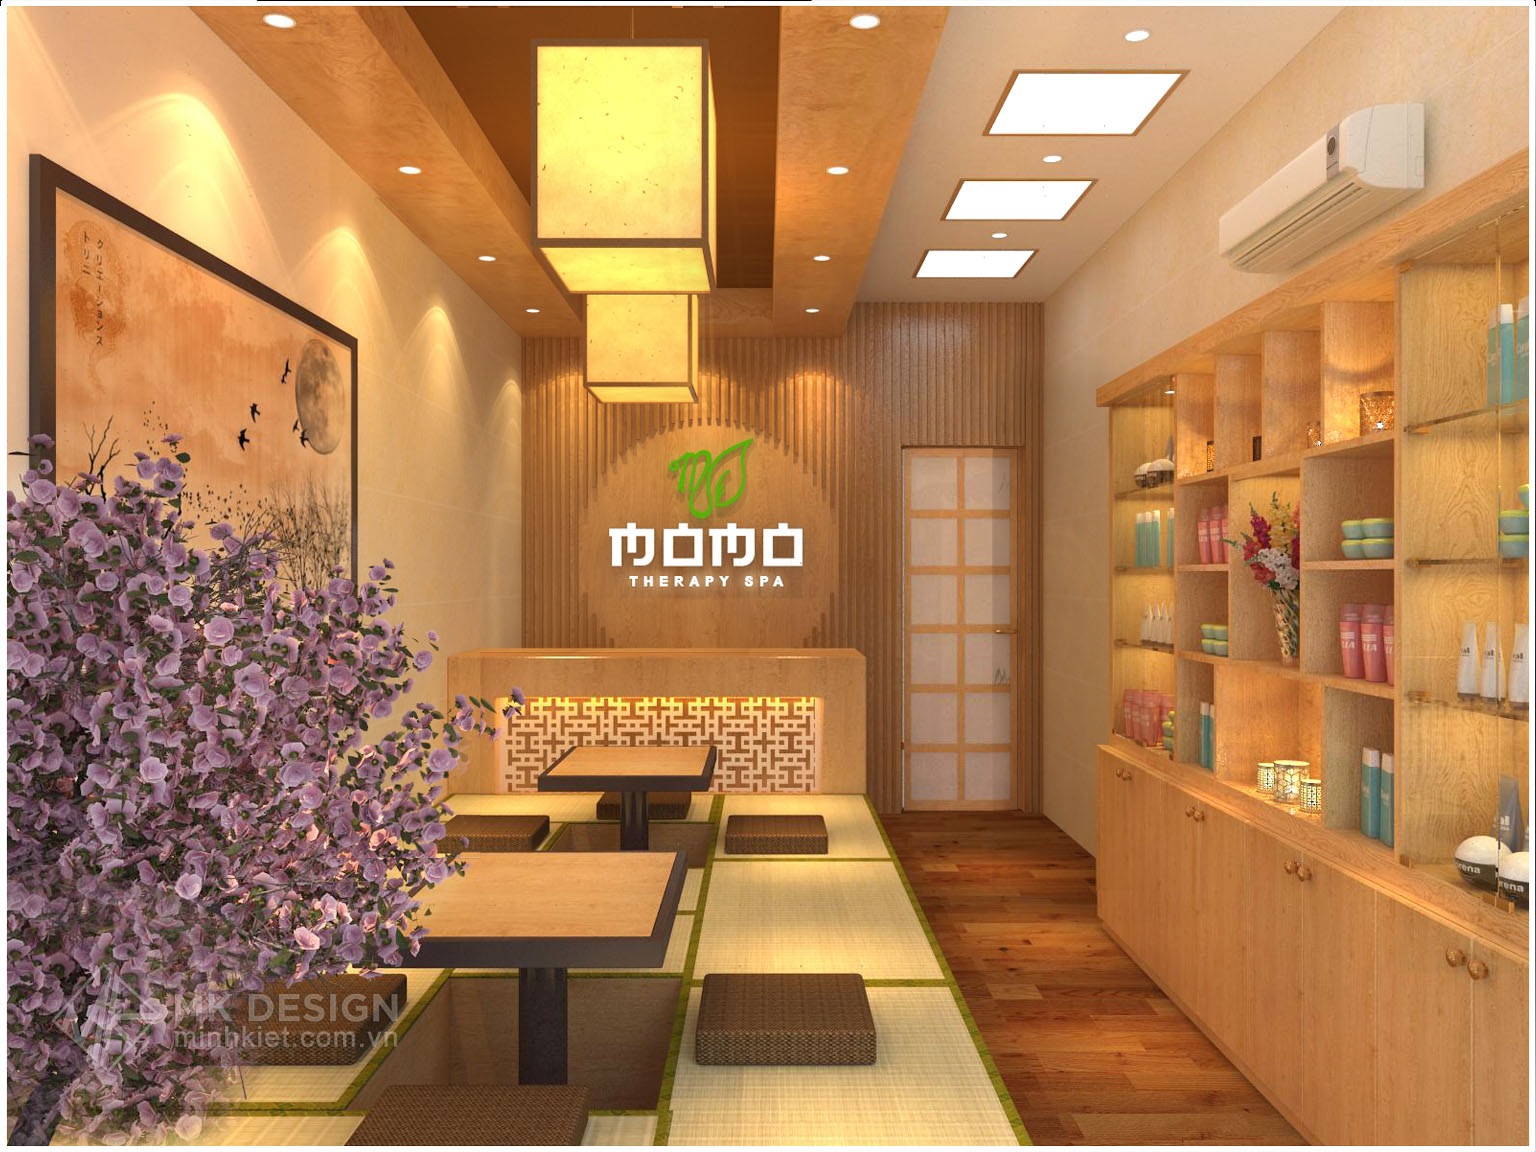 spa-momo-nhat-ban-Minh-Kiet-Design17